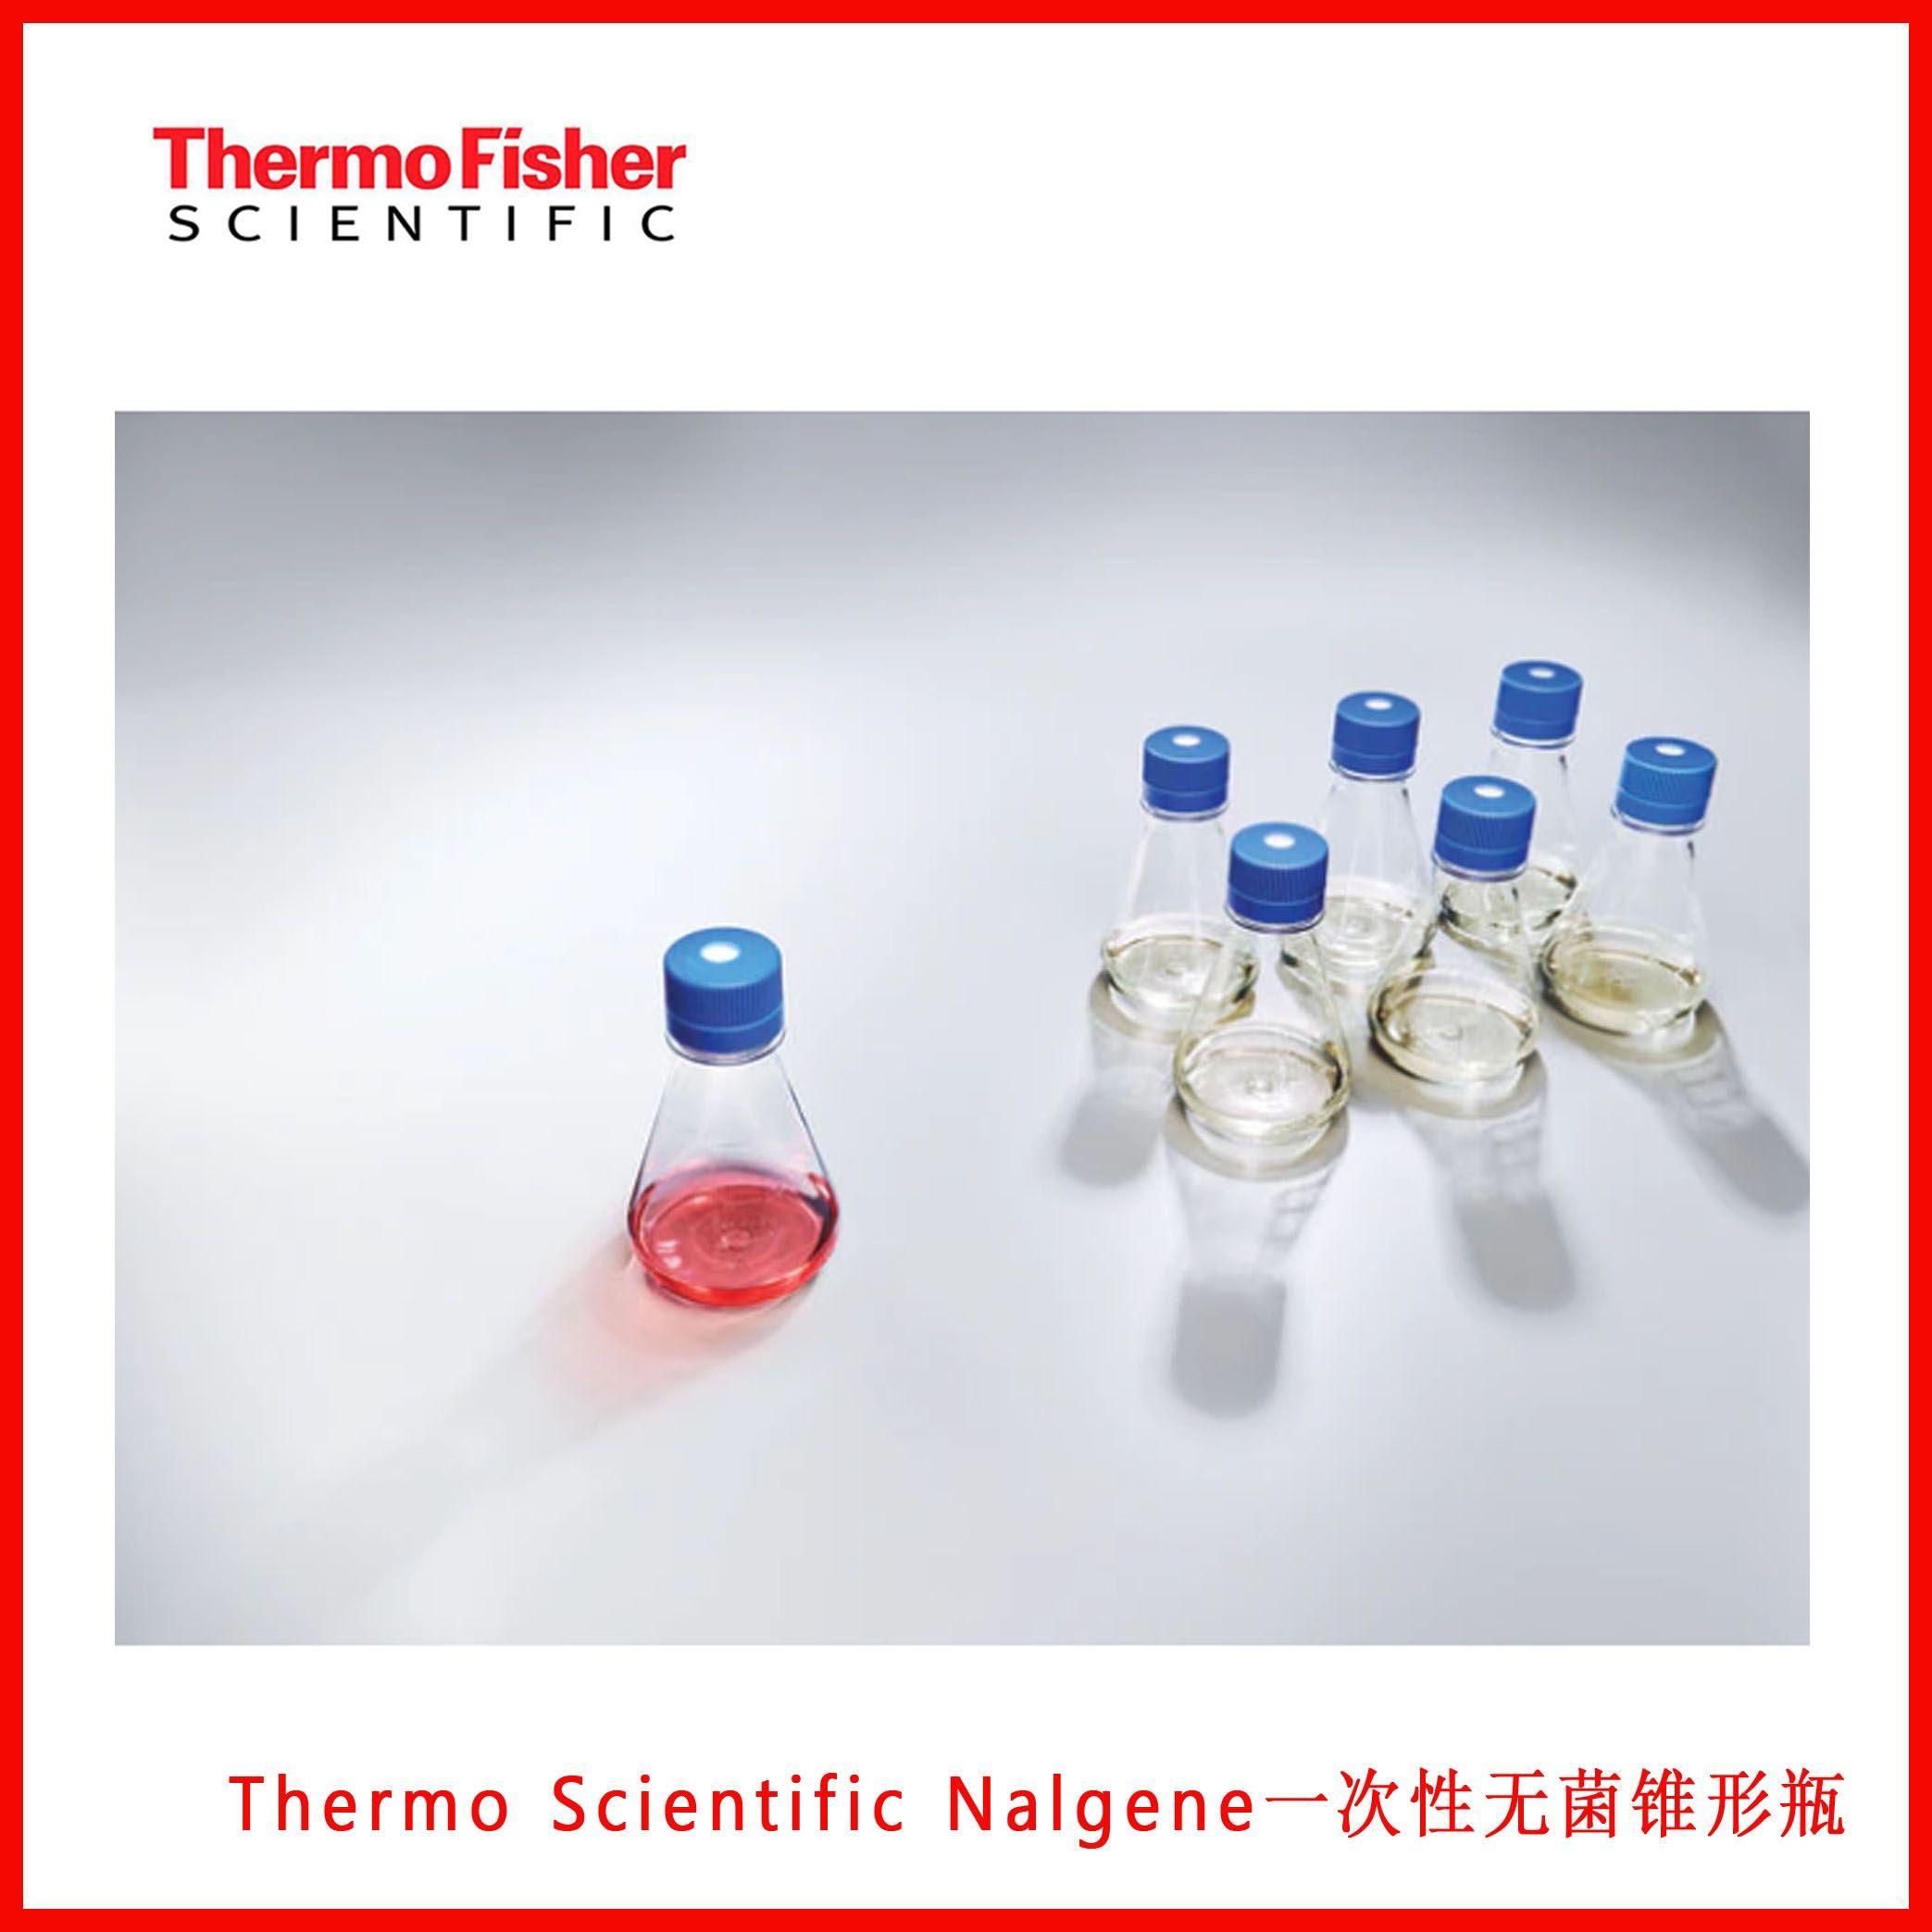 Thermo Scientific Nalgene一次性无菌锥形瓶,带盖,现货